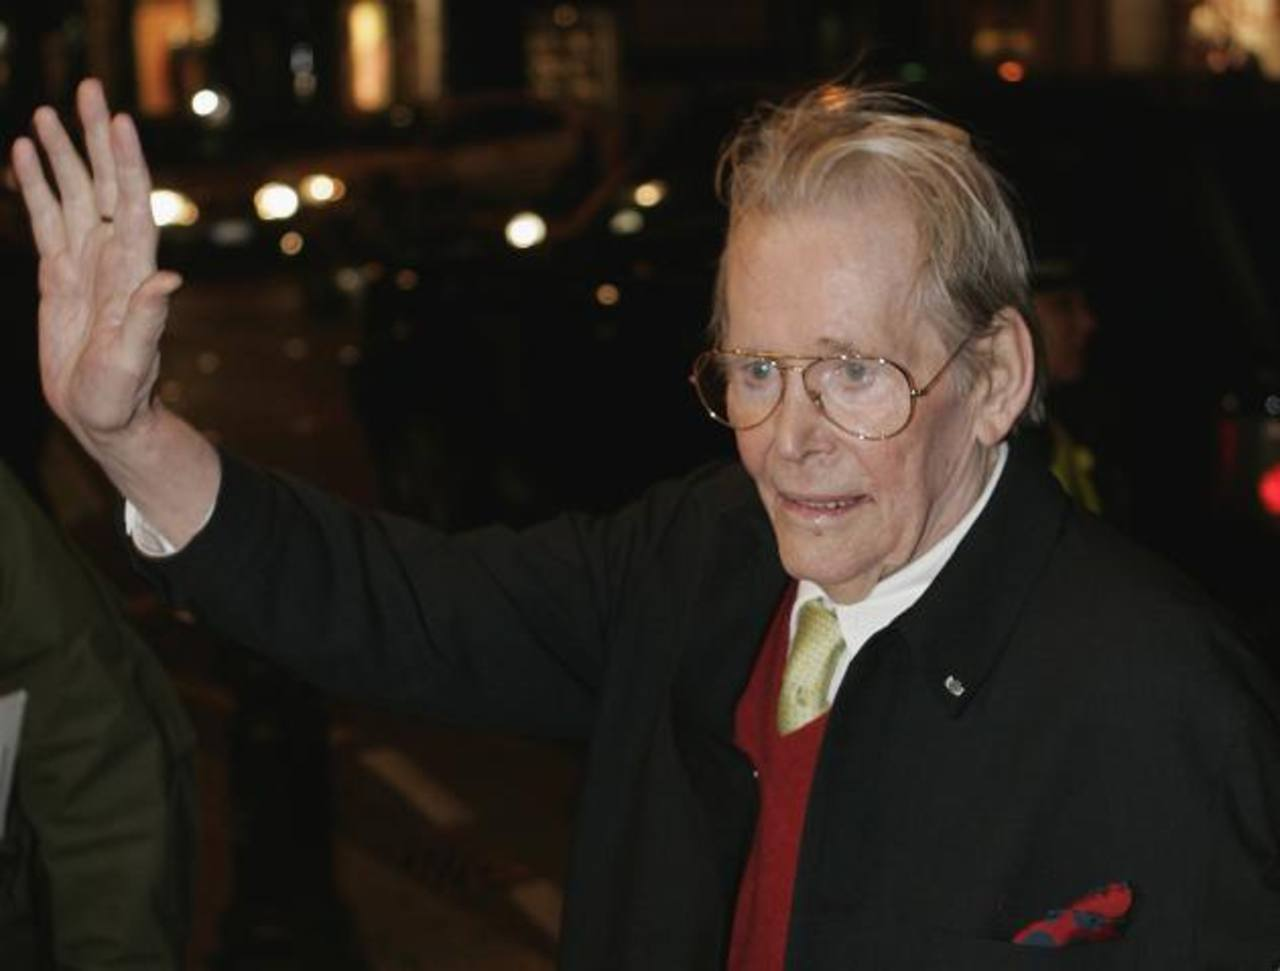 Fallece Peter O'Toole, astro de Lawrence de Arabia